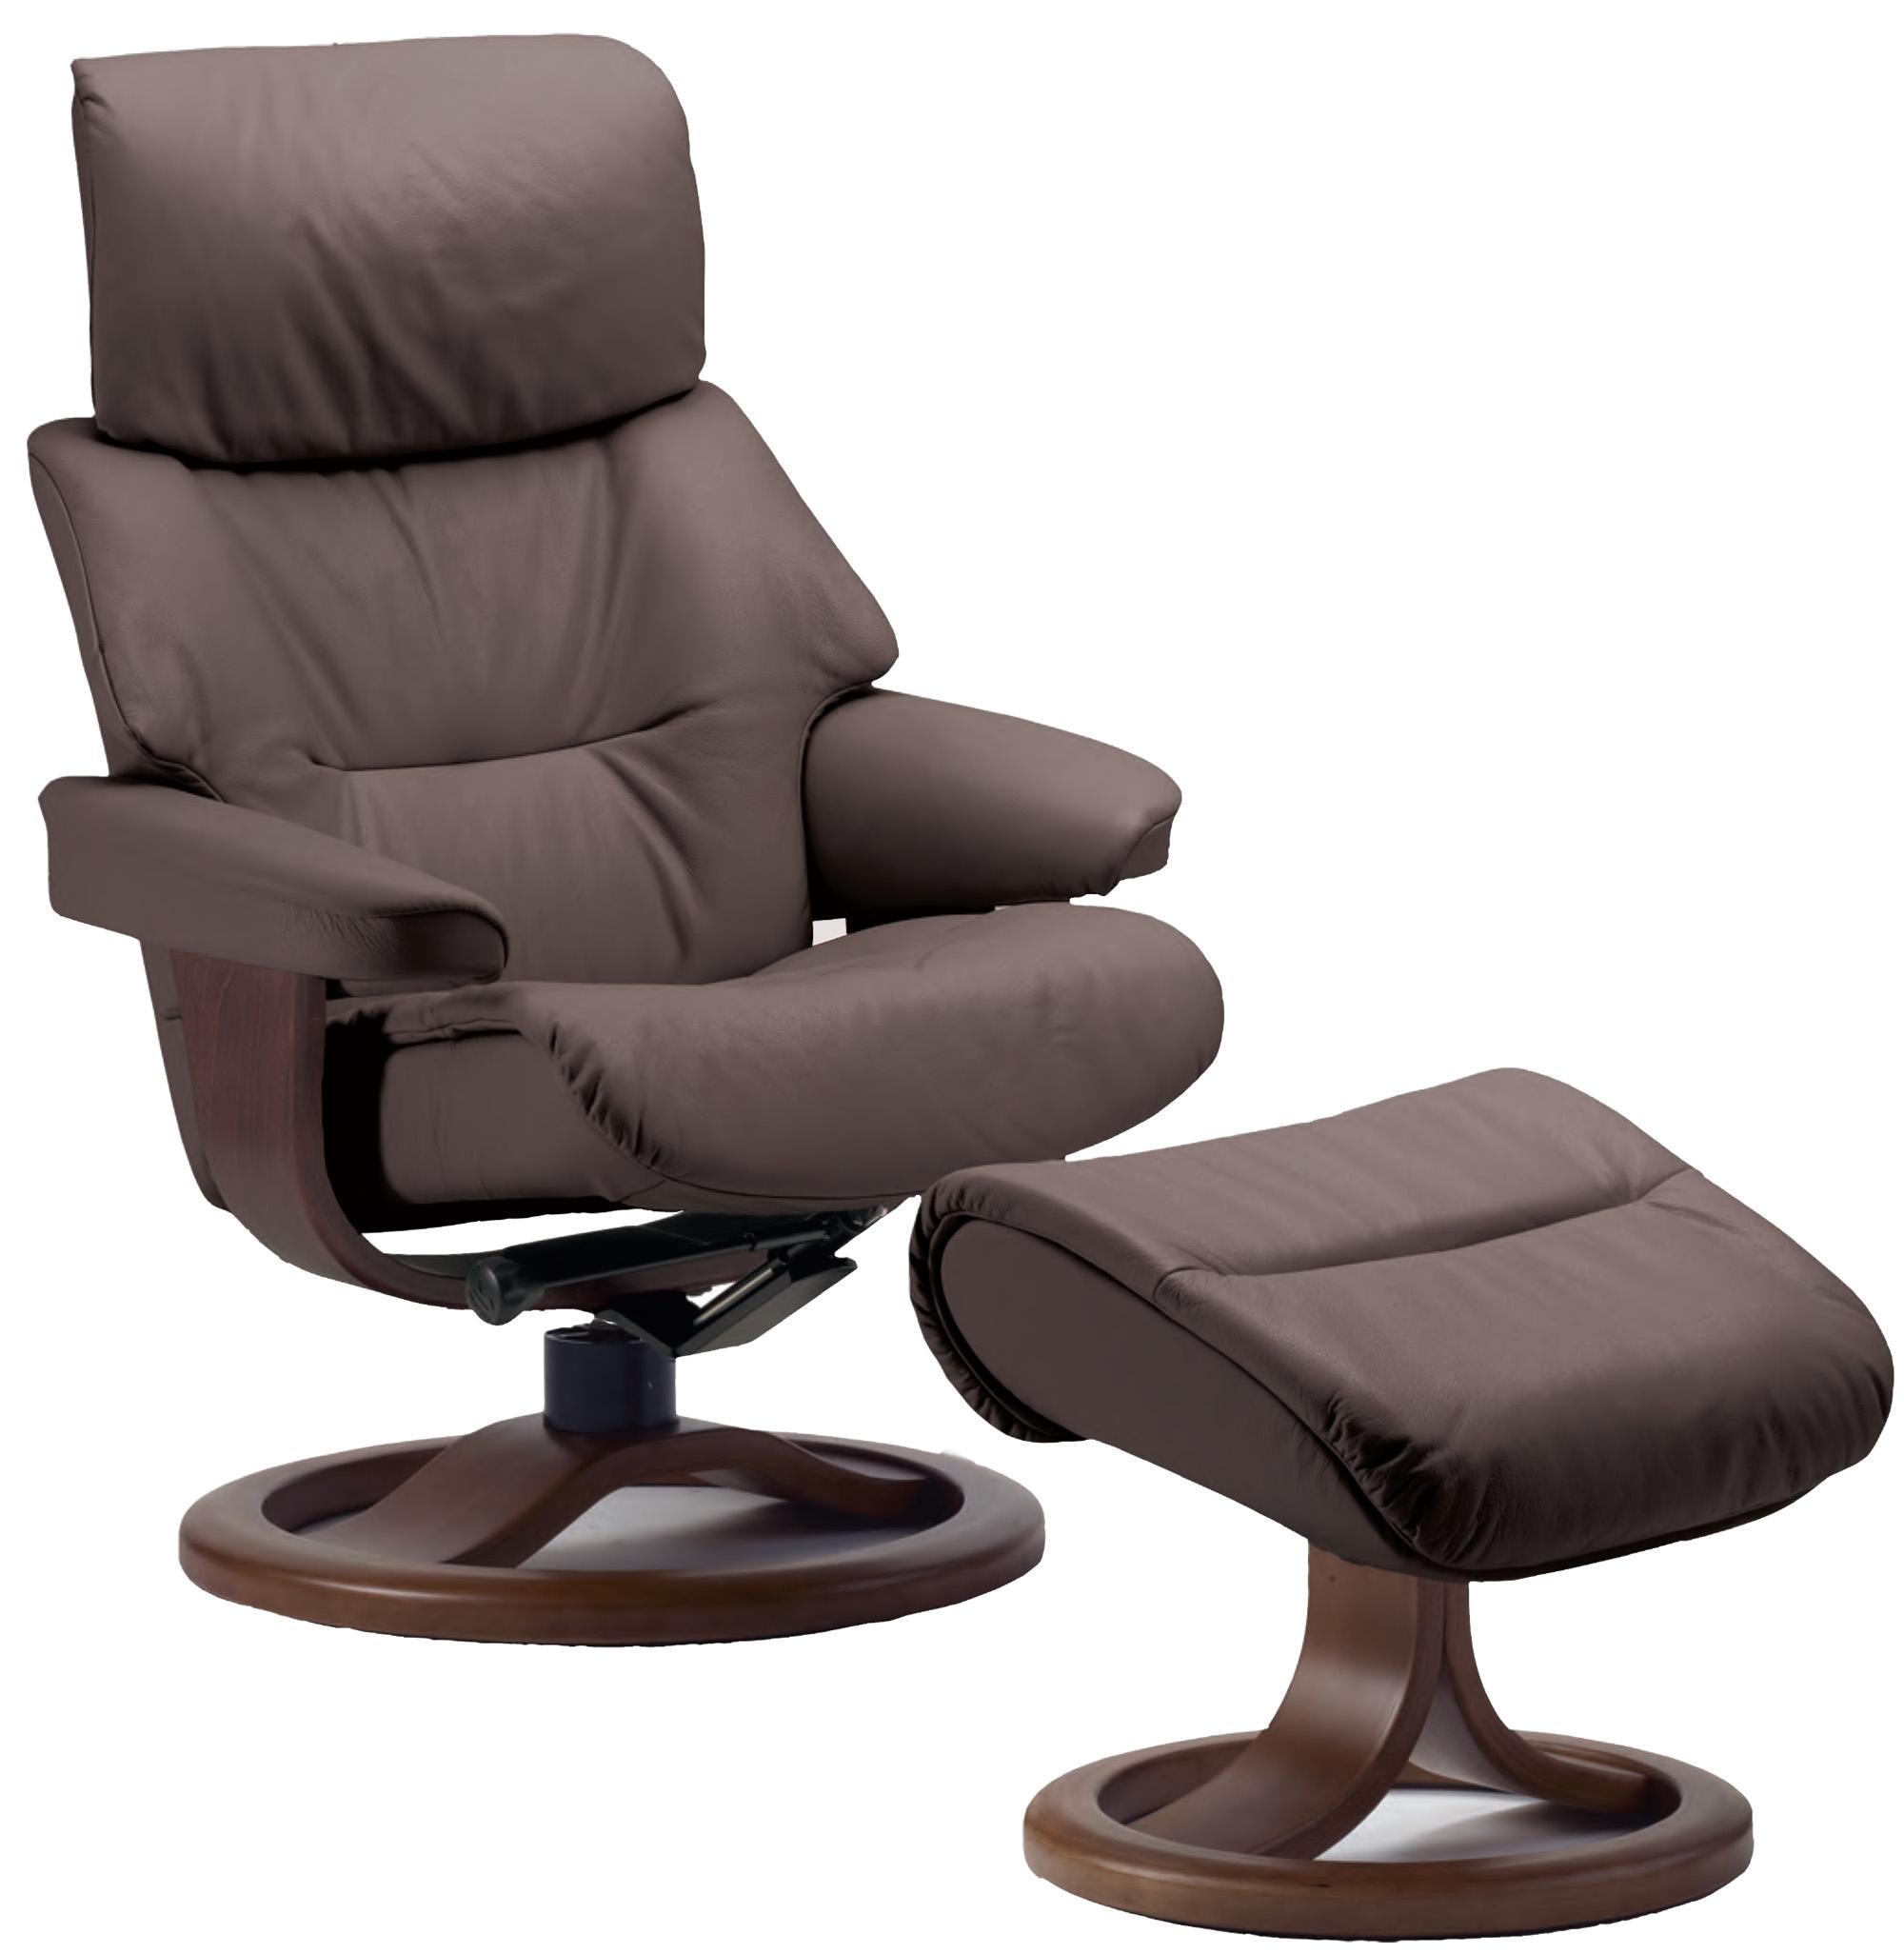 Fjords Grip Ergonomic Leather Recliner Chair + Ottoman